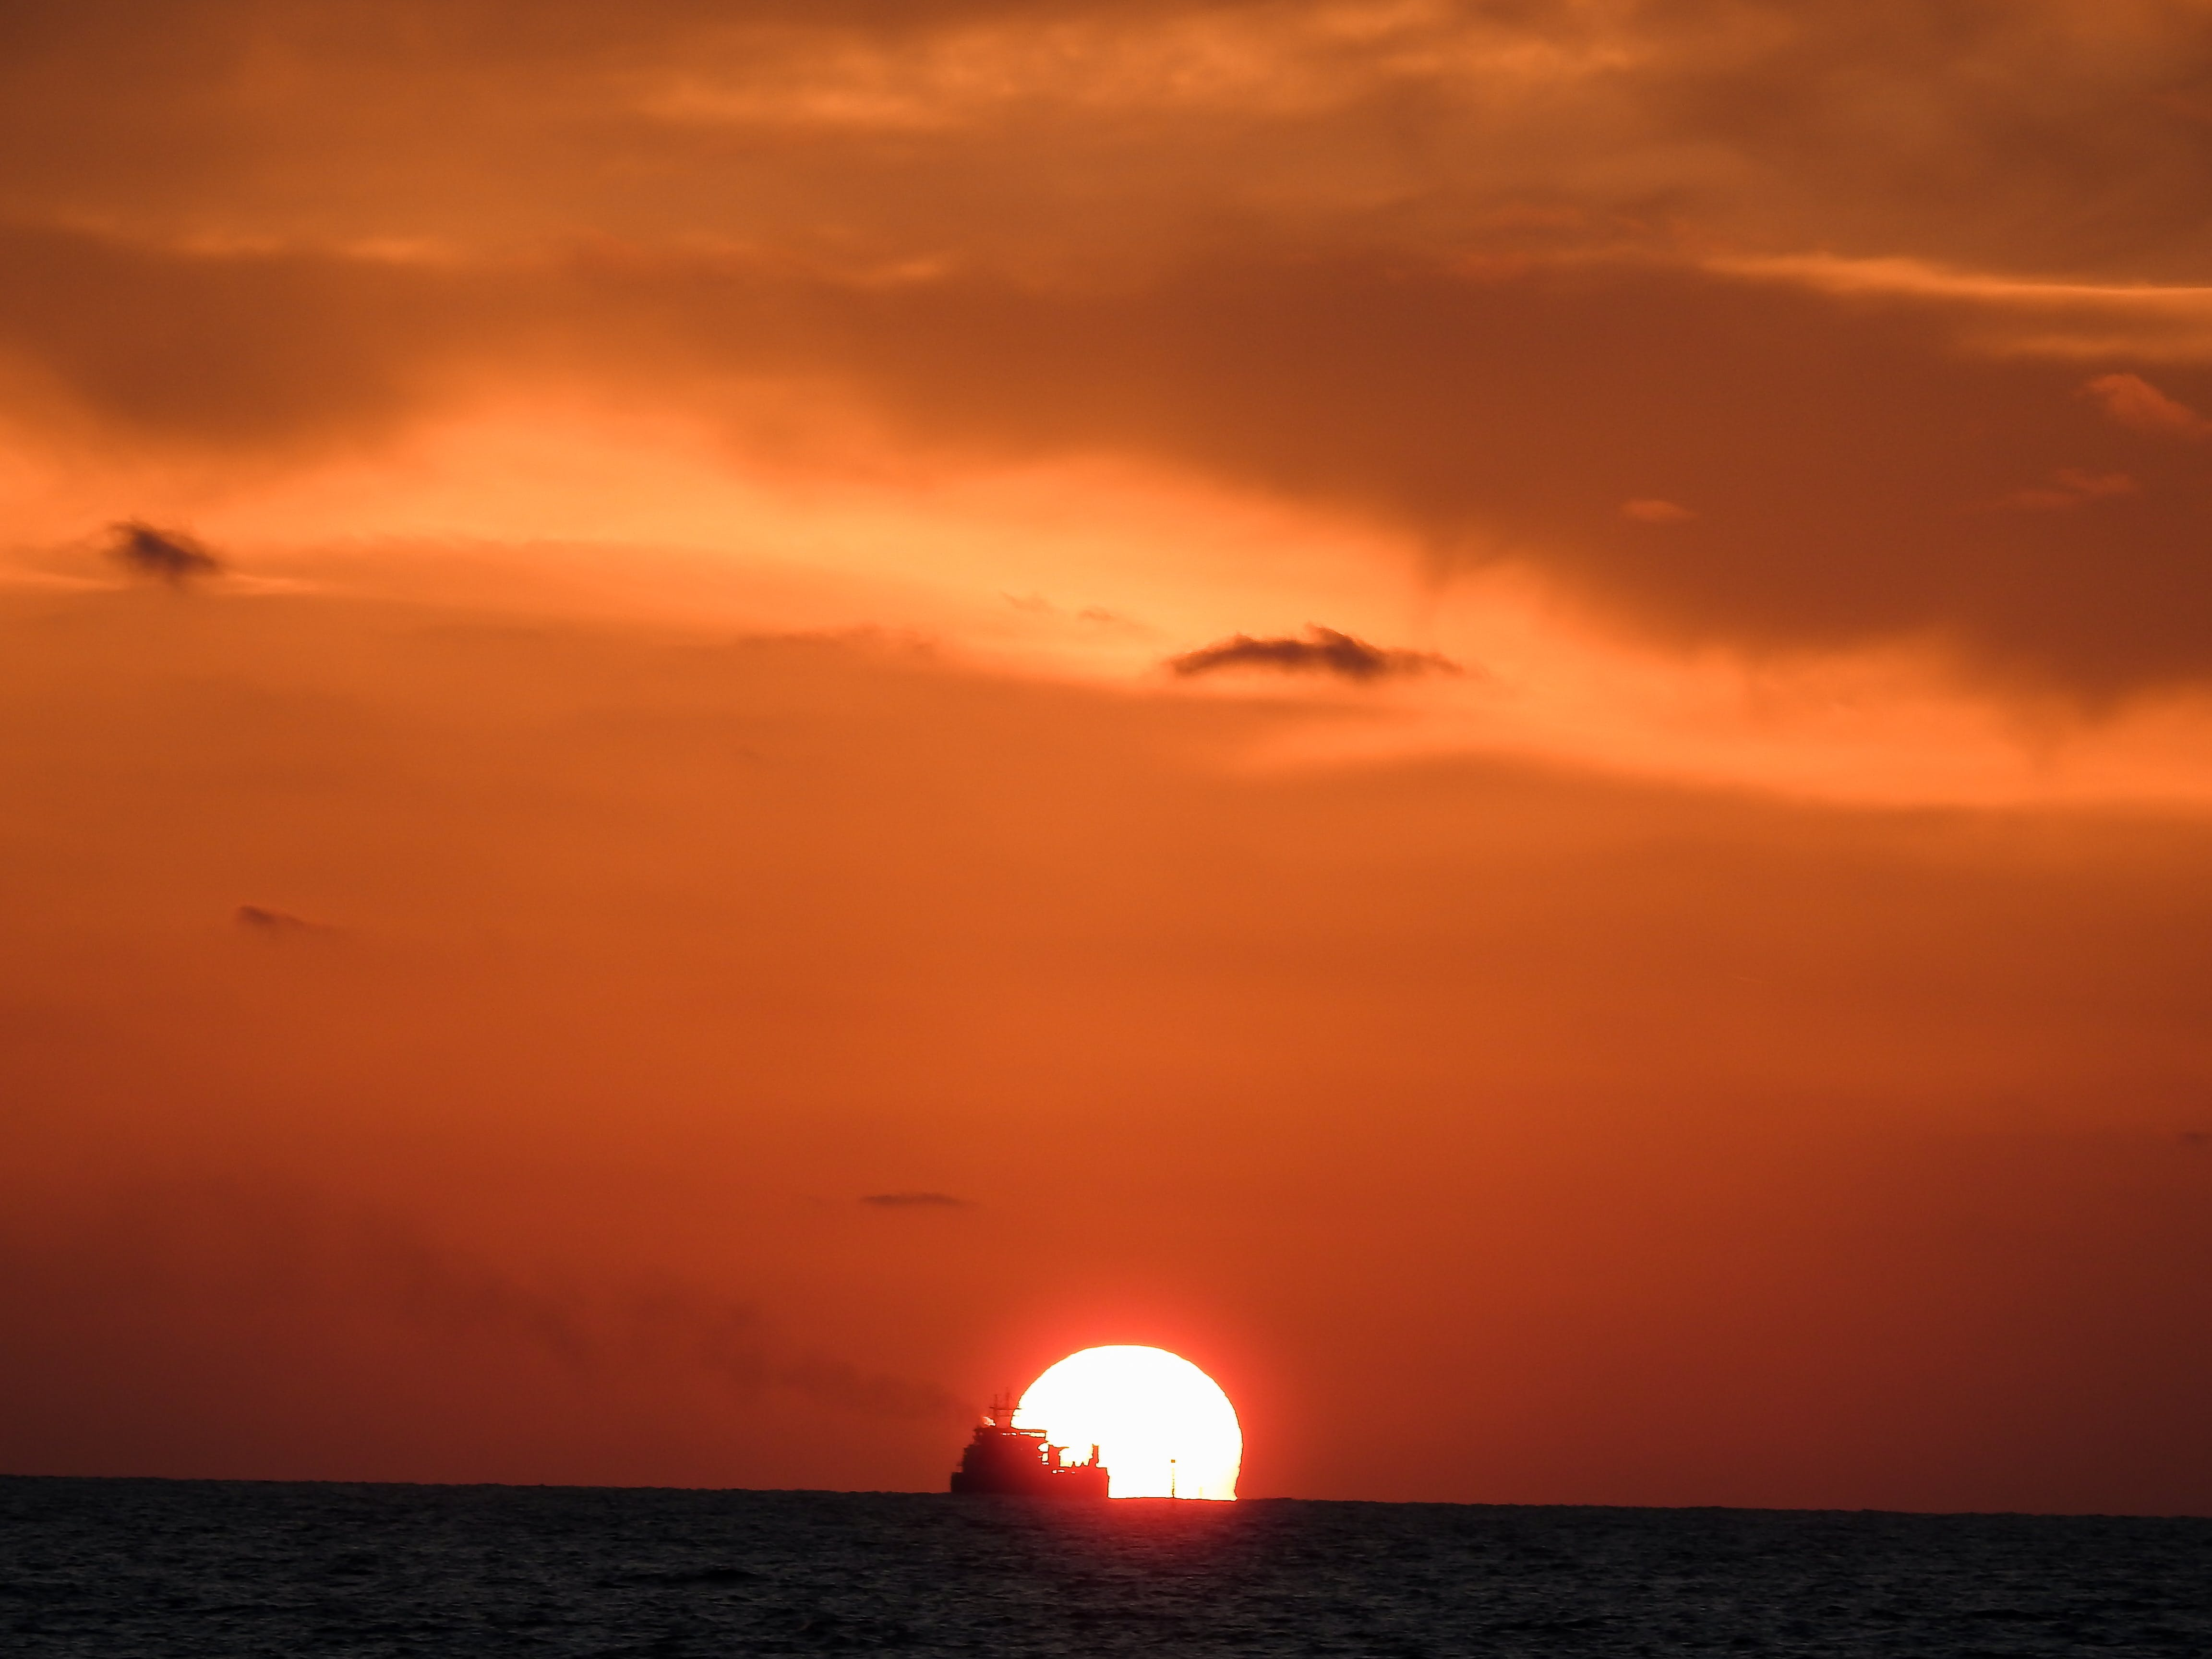 Free stock photo of cargo ship, evening sun, golden sunset, sunset